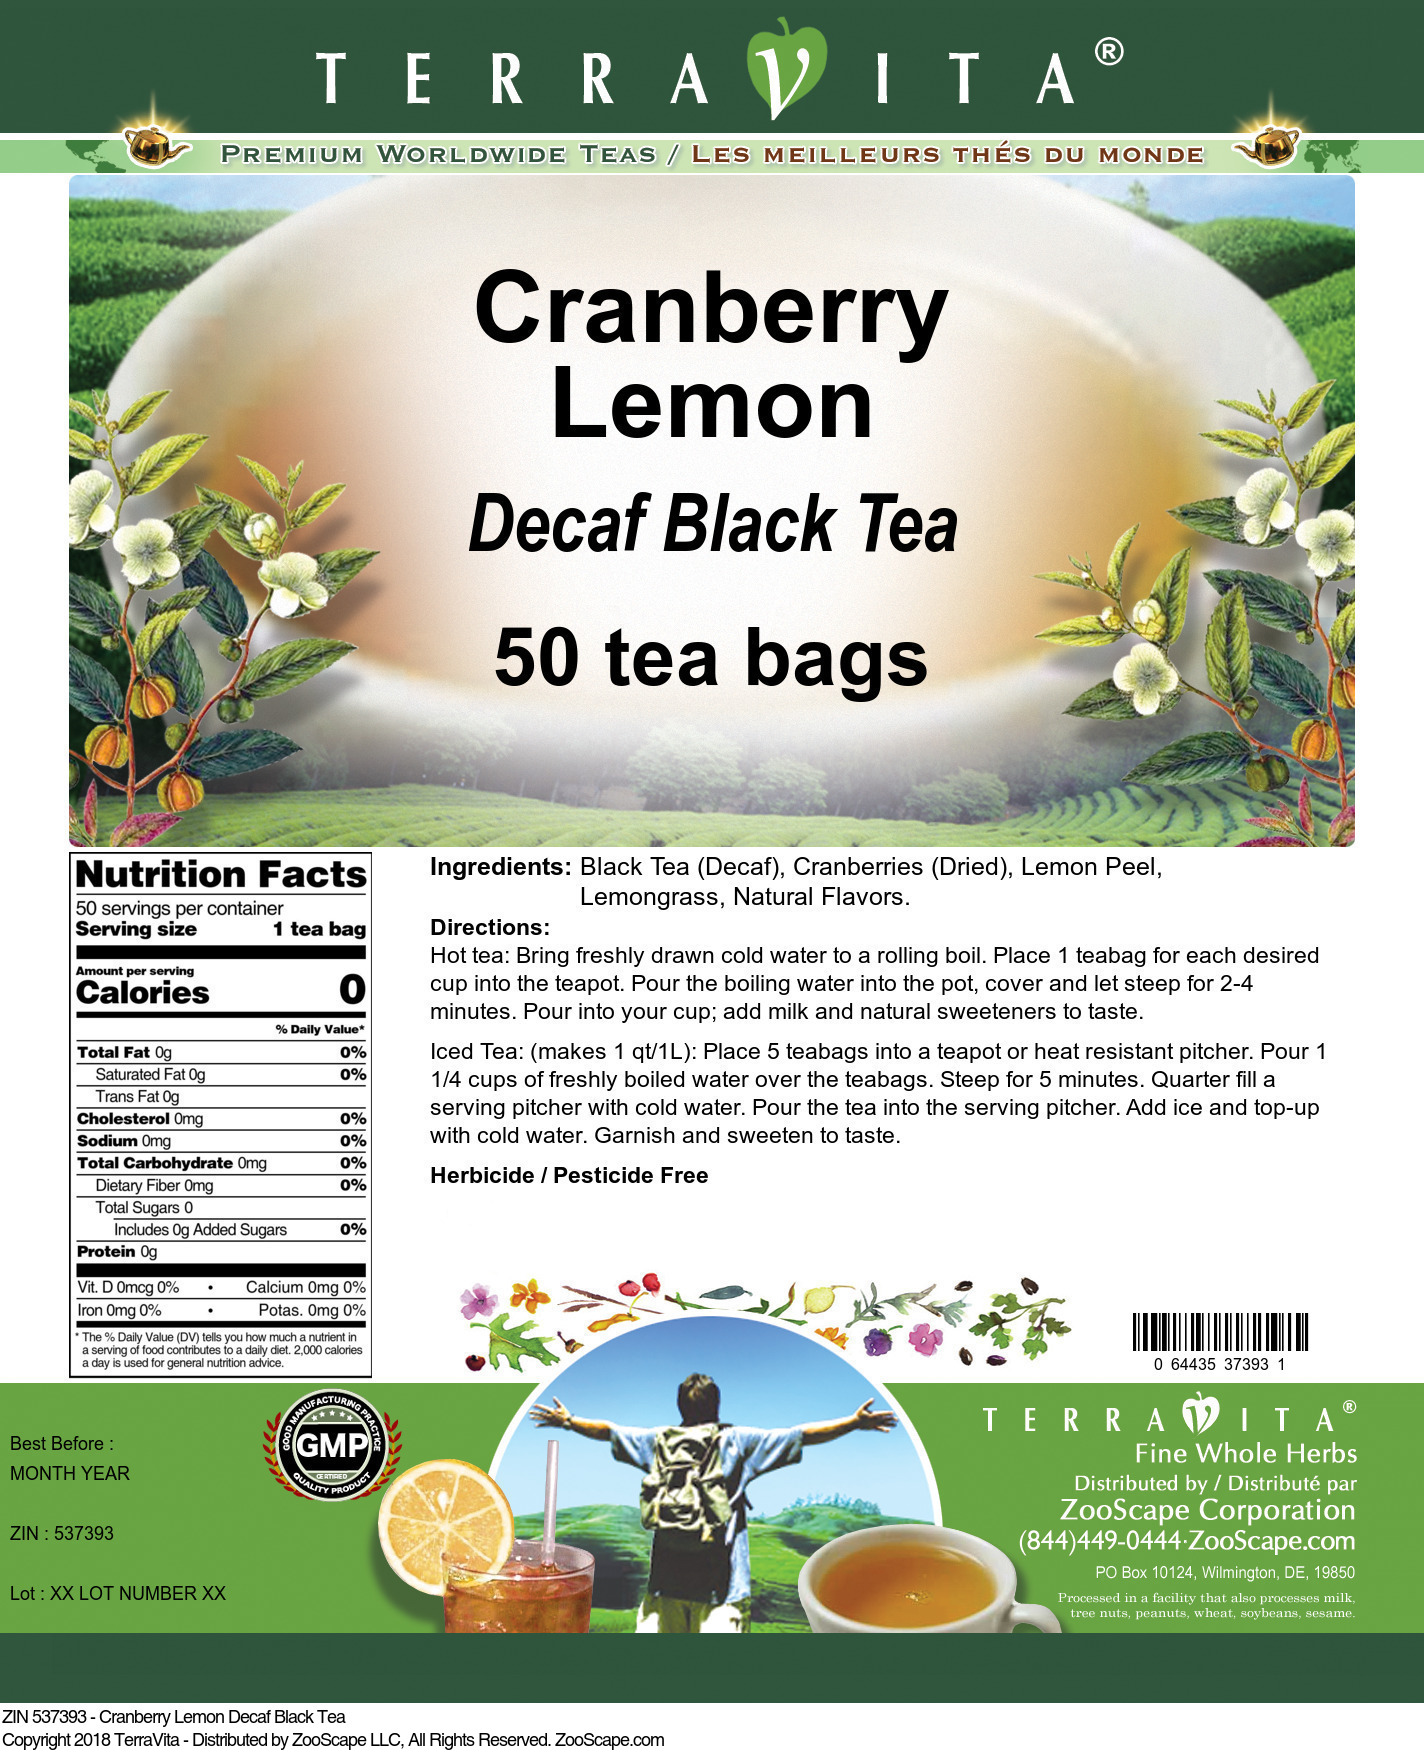 Cranberry Lemon Decaf Black Tea